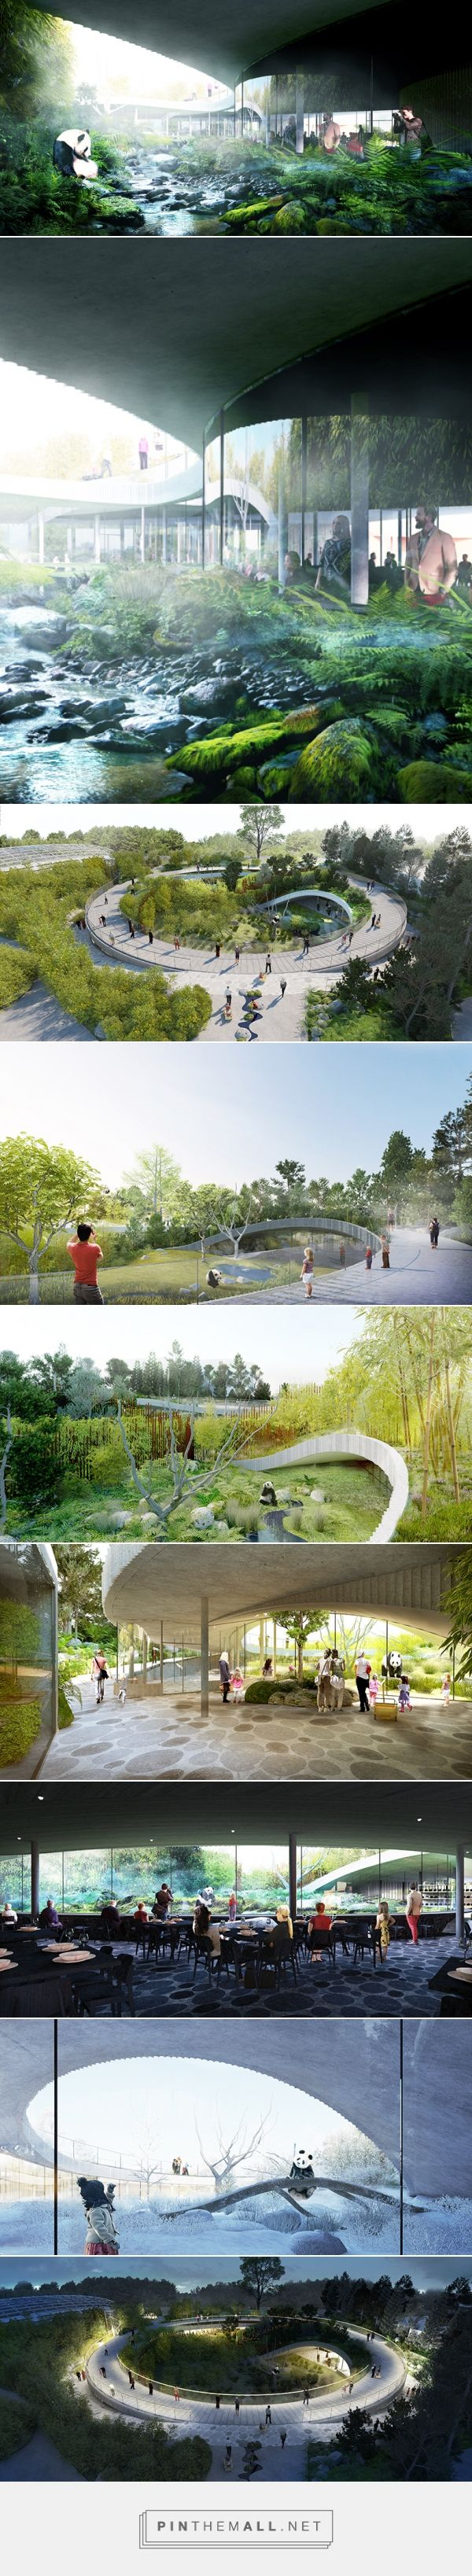 BIG plans yin and yang panda house for copenhagen zoo - created via https://pinthemall.net